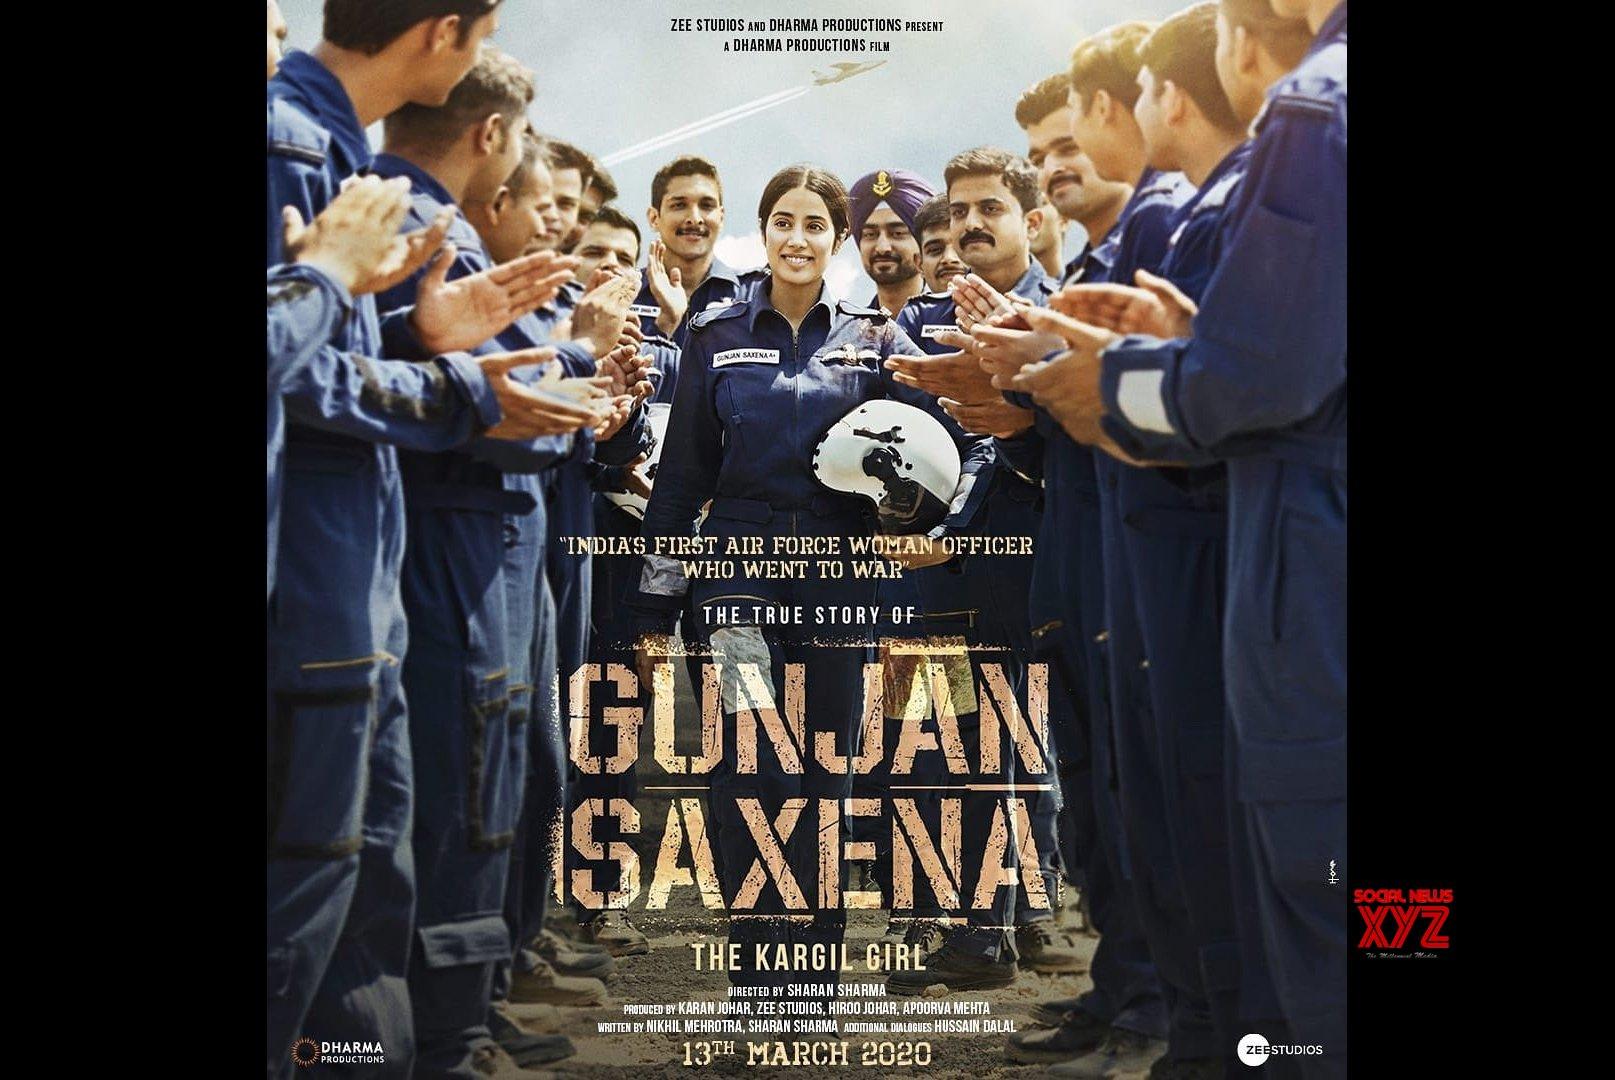 Gunjan Saxena Review Set Piece Biopic Manages To Regale Rating Social News Xyz